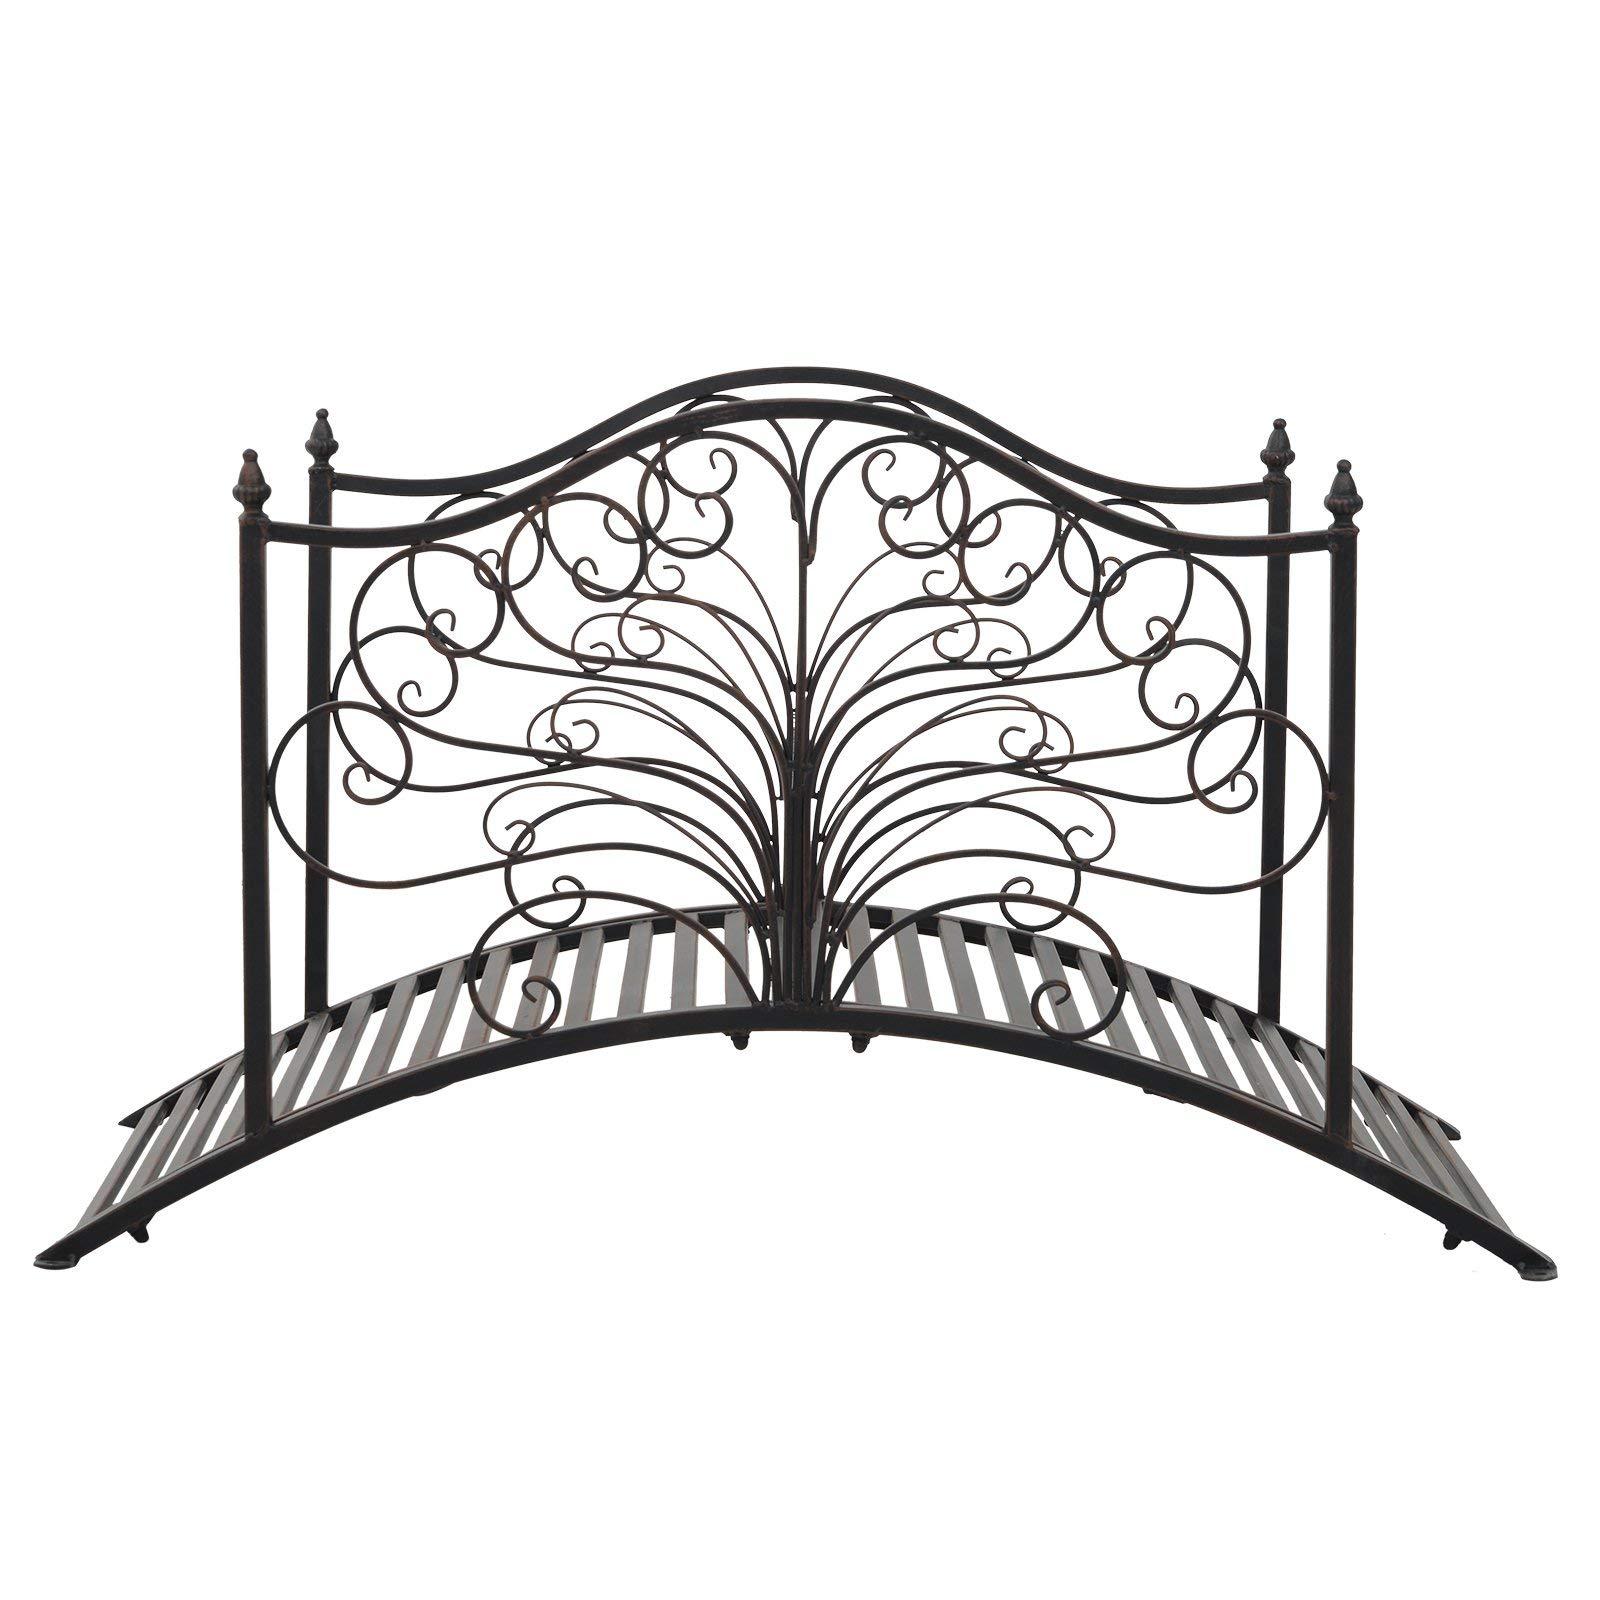 Festnight Outdoor Metal Garden Bridge Patio Backyard Decorative Bridge Black Bronze, 4' by Festnight (Image #8)